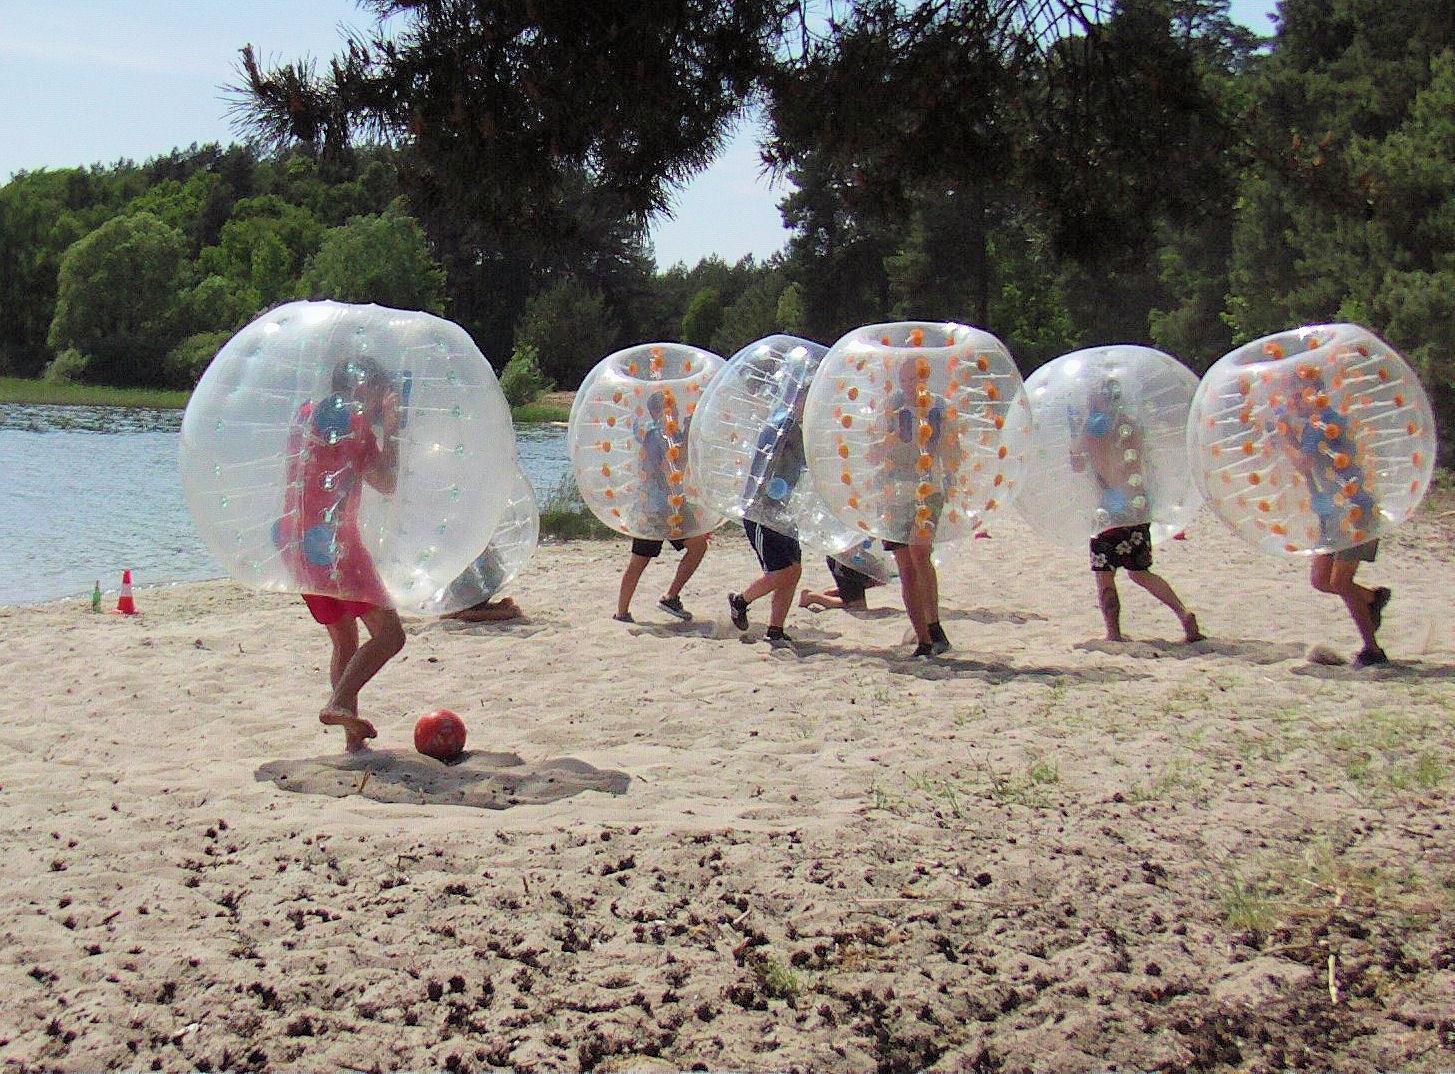 8 x Bubble Soccer Body Soccer Bumper Balls mieten inkl Anlieferung in Meck-Pom